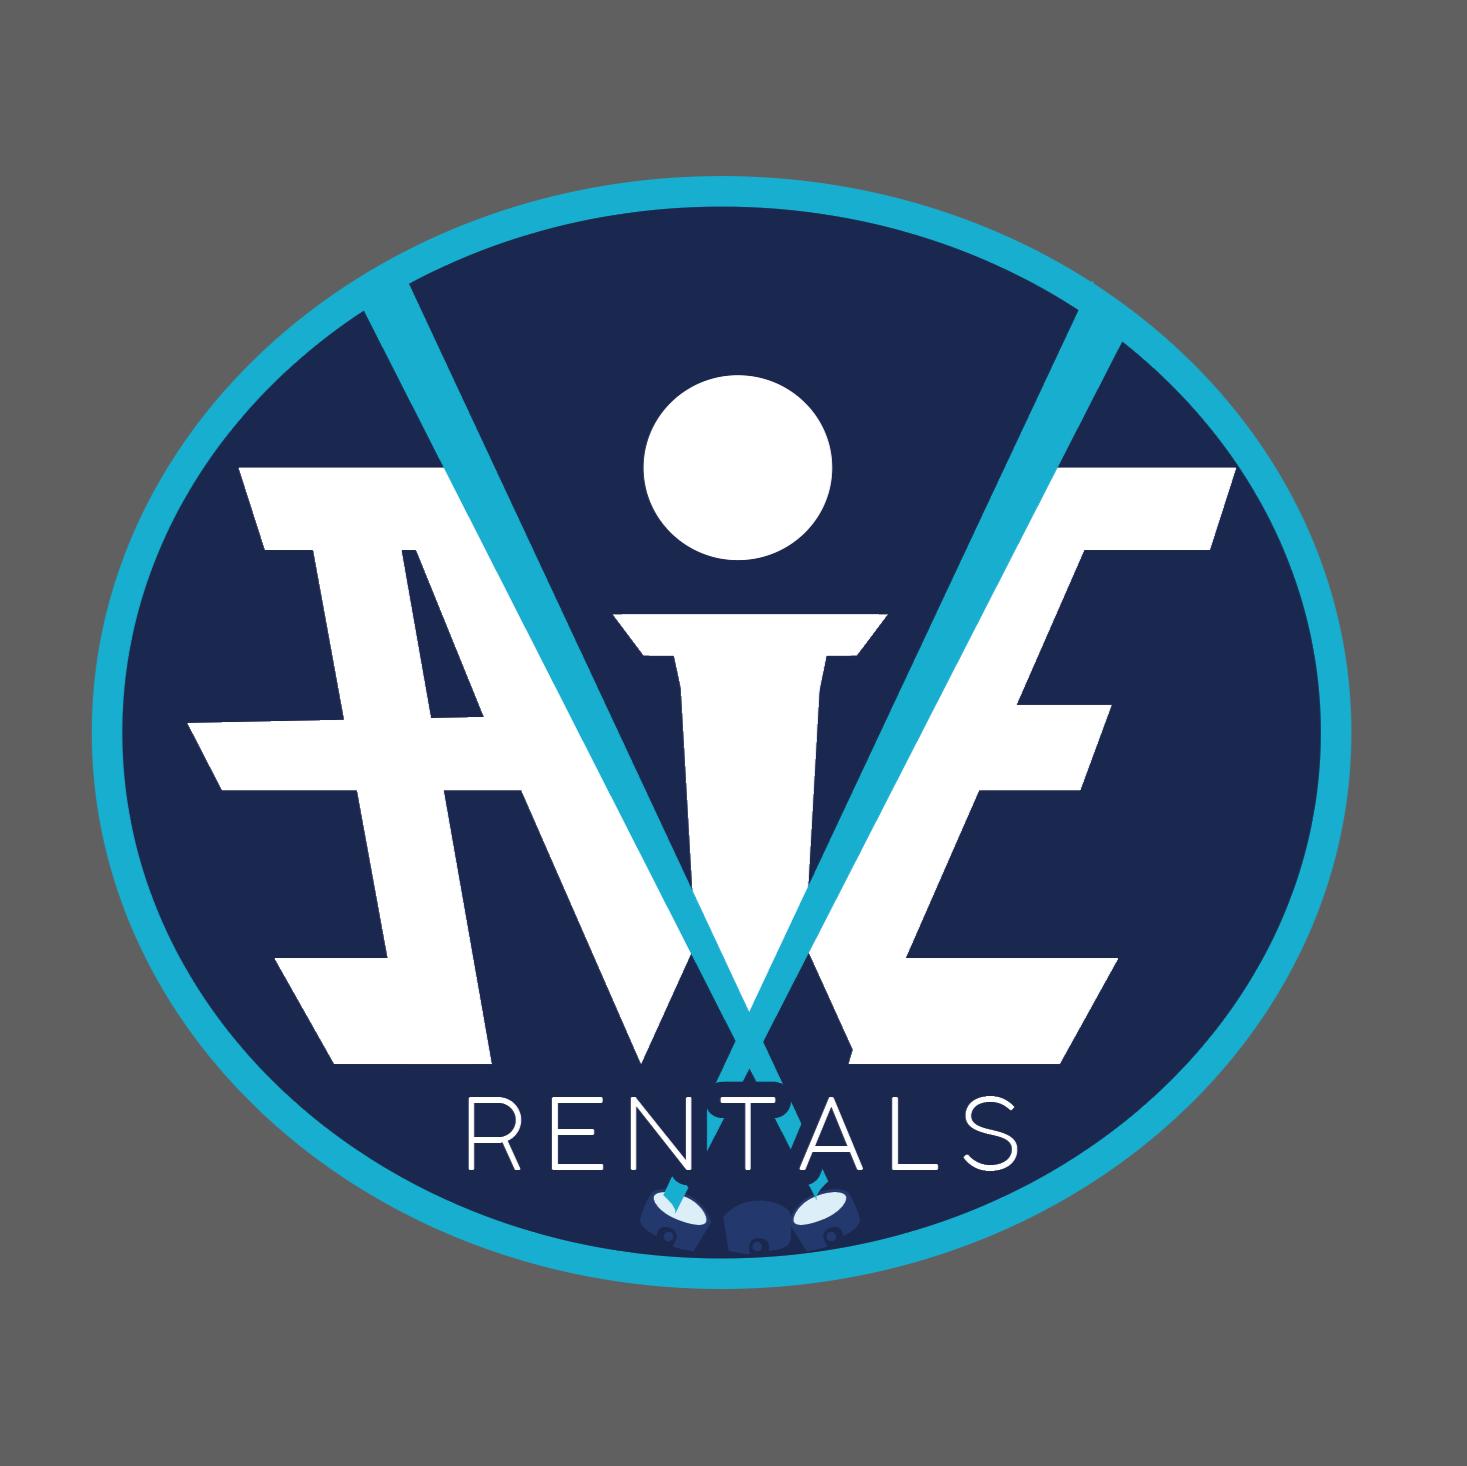 AIE Rentals